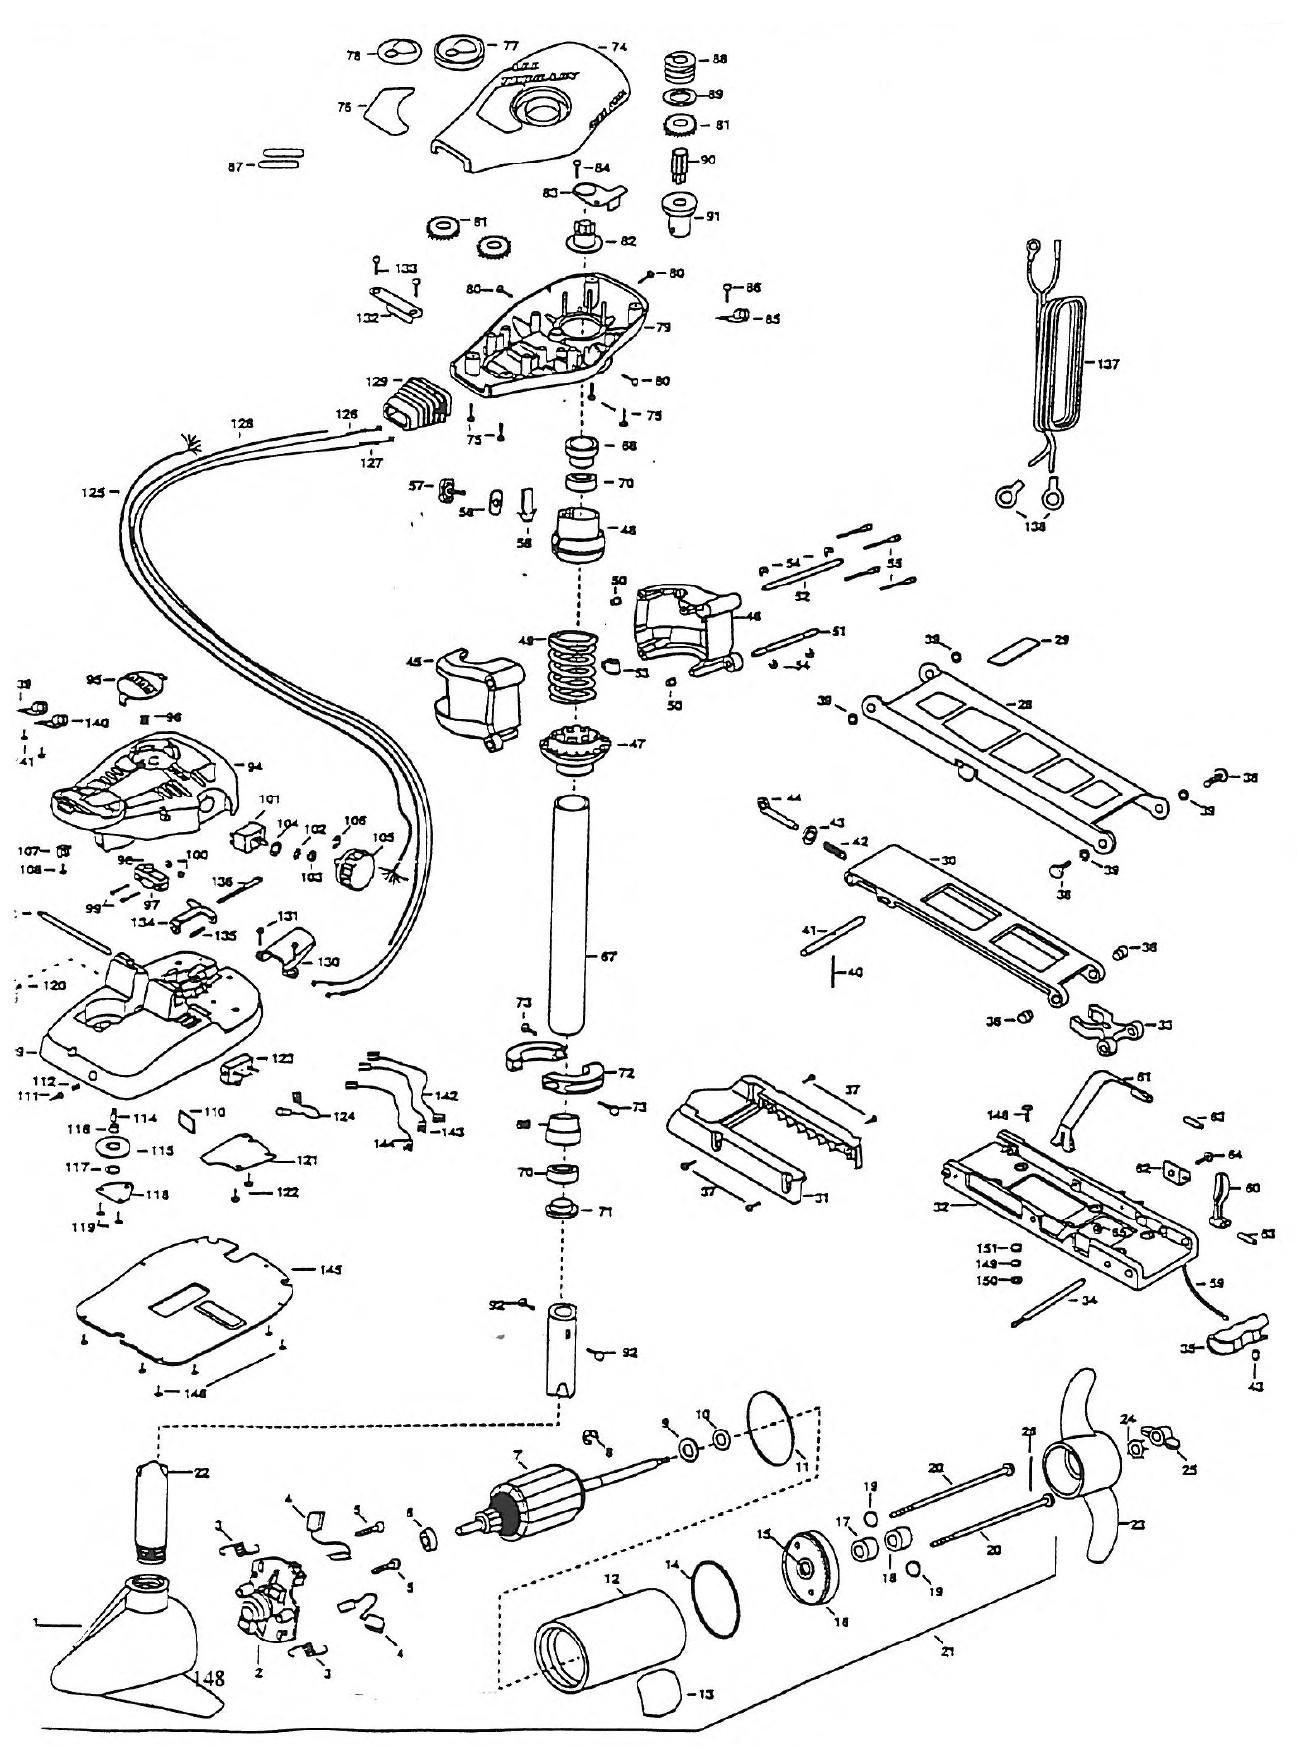 wiring chrysler harness 05107099ak , lincoln town car spark plug wiring  diagram , ford western plow wiring diagram , audi q7 trailer wiring , 74  bug